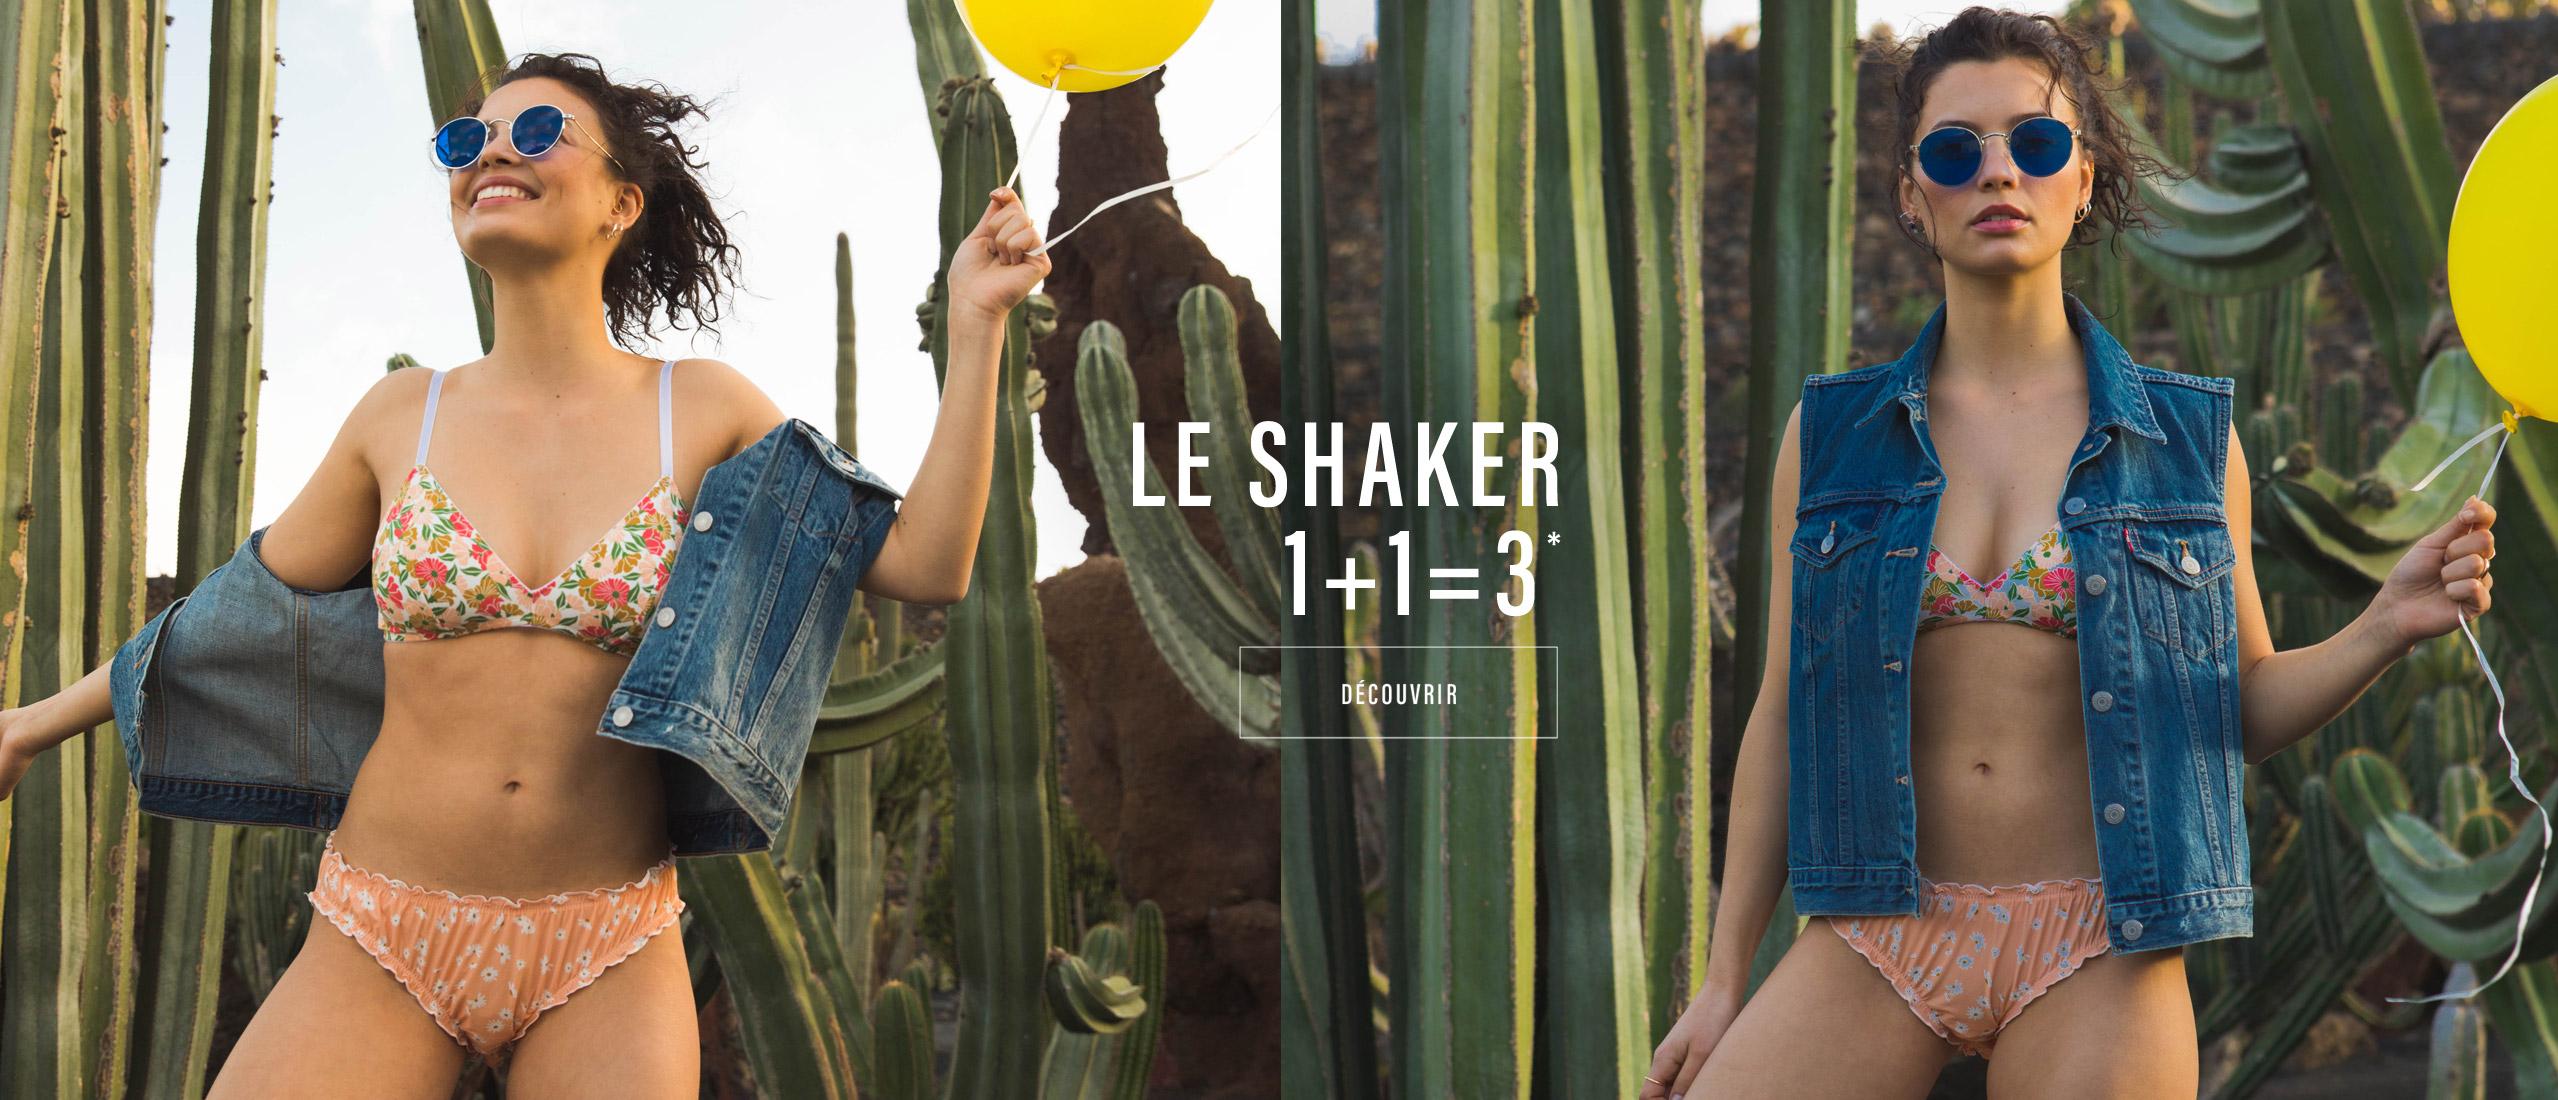 Le shaker : 1+1=3*